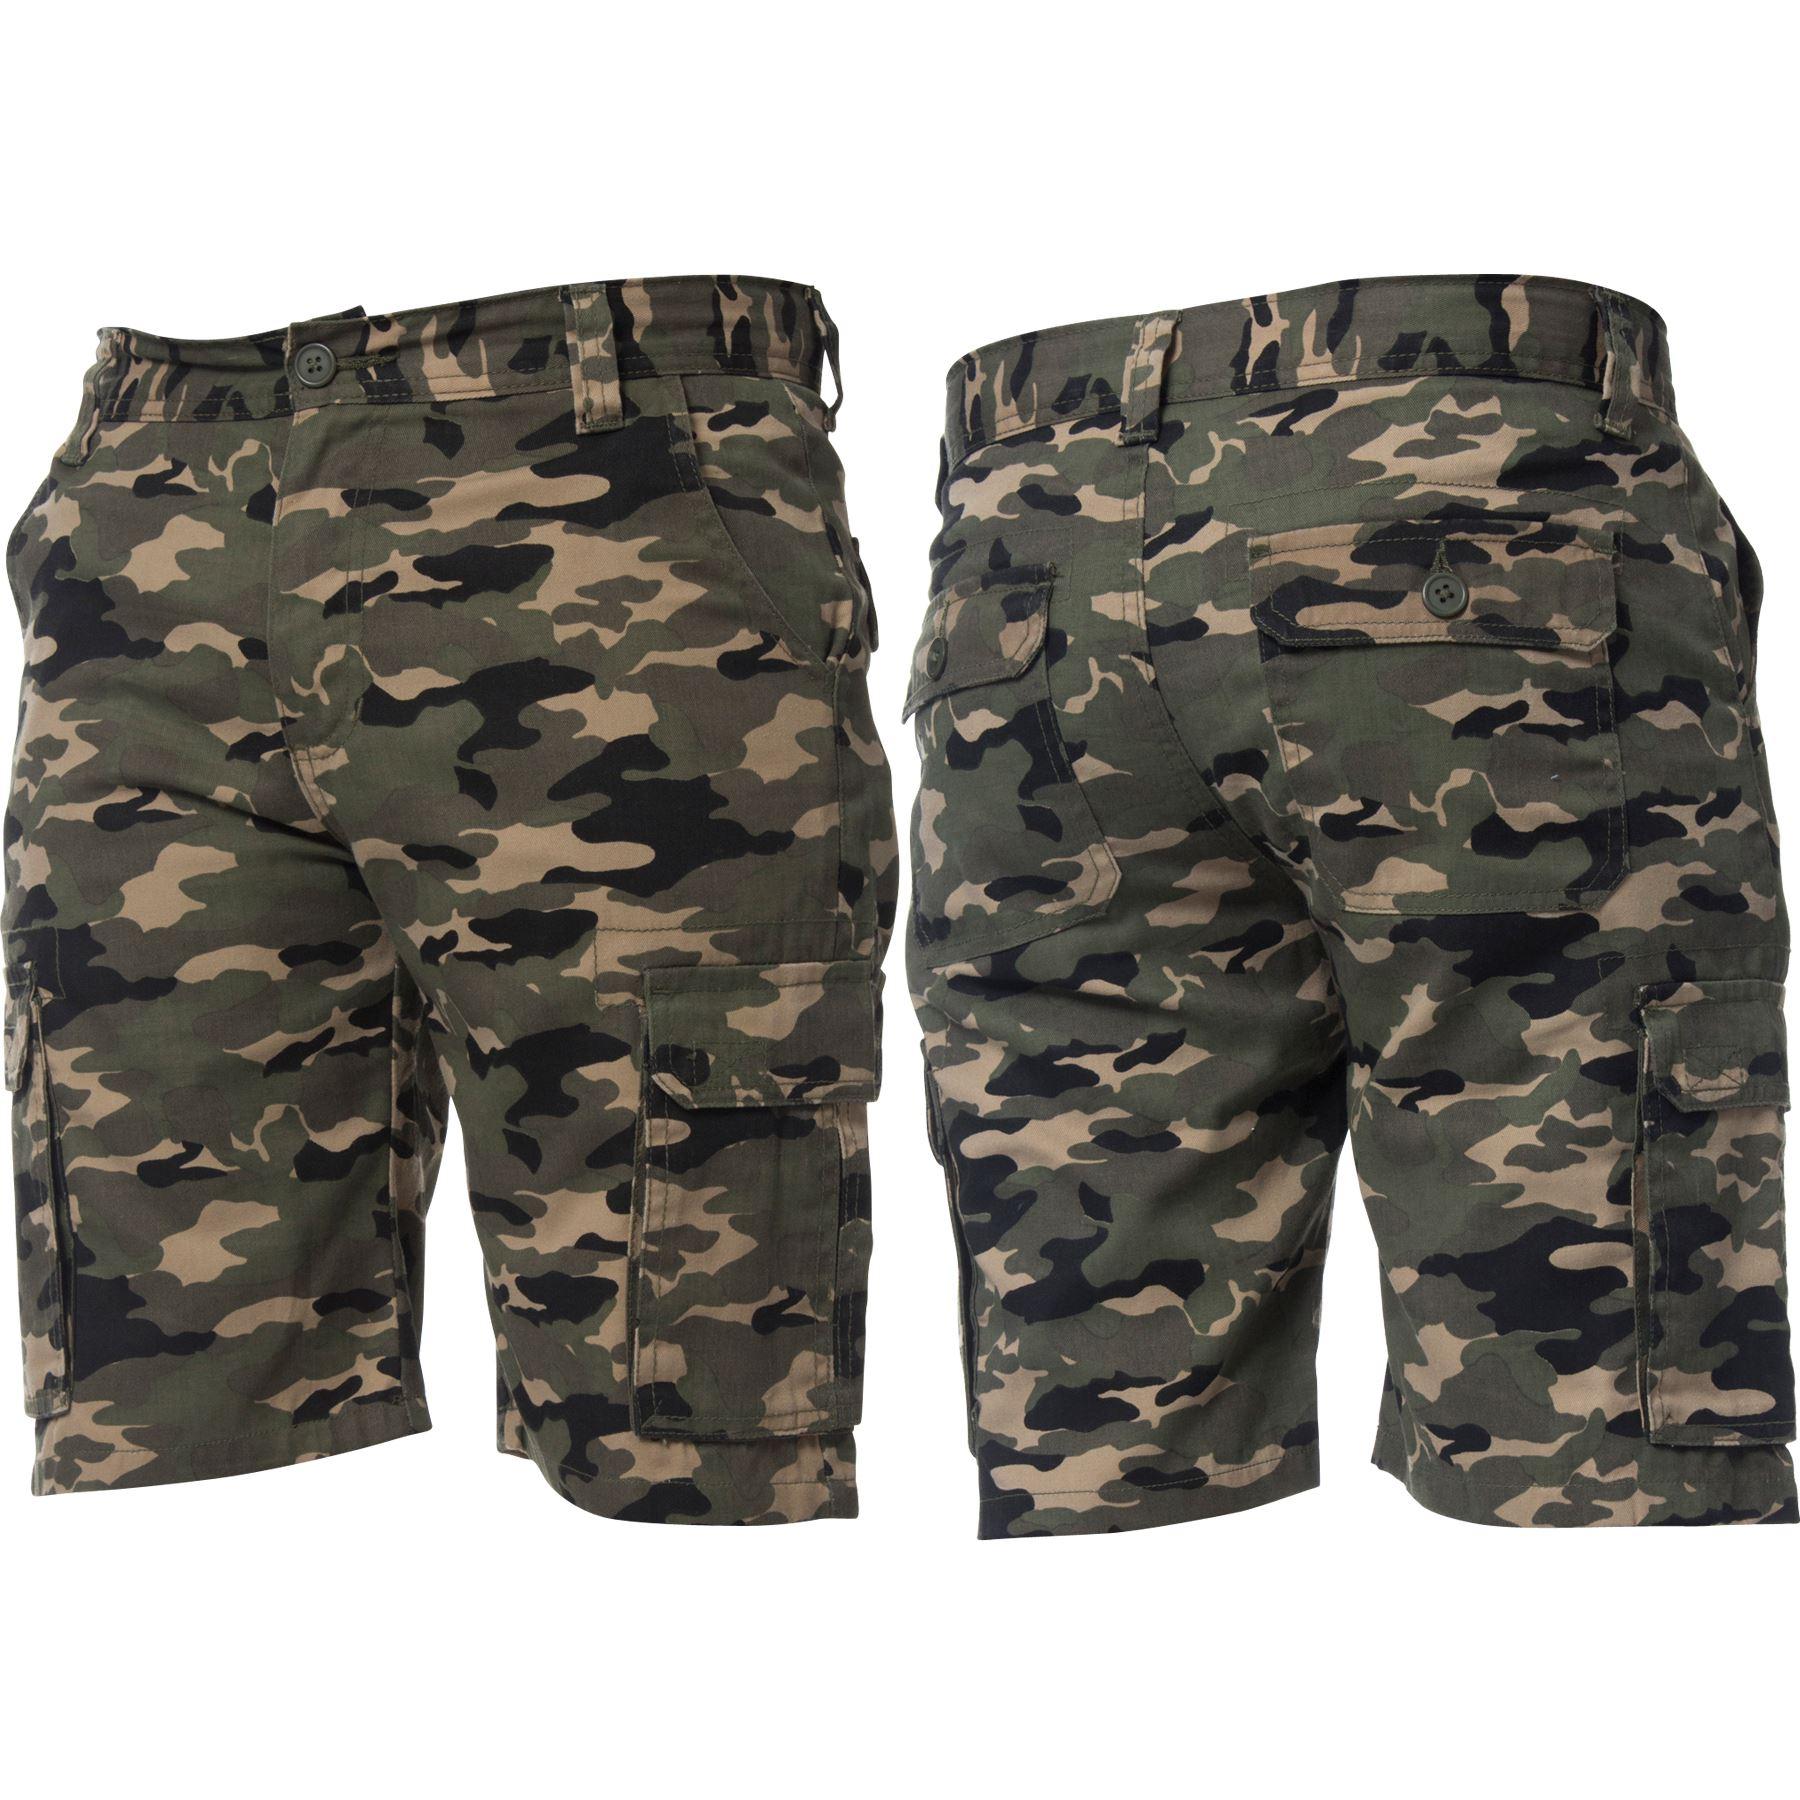 Kruze-Jeans-para-Hombre-Pantalones-Cortos-Combate-del-ejercito-camuflaje-Camo-Trabajo-Shorts miniatura 17